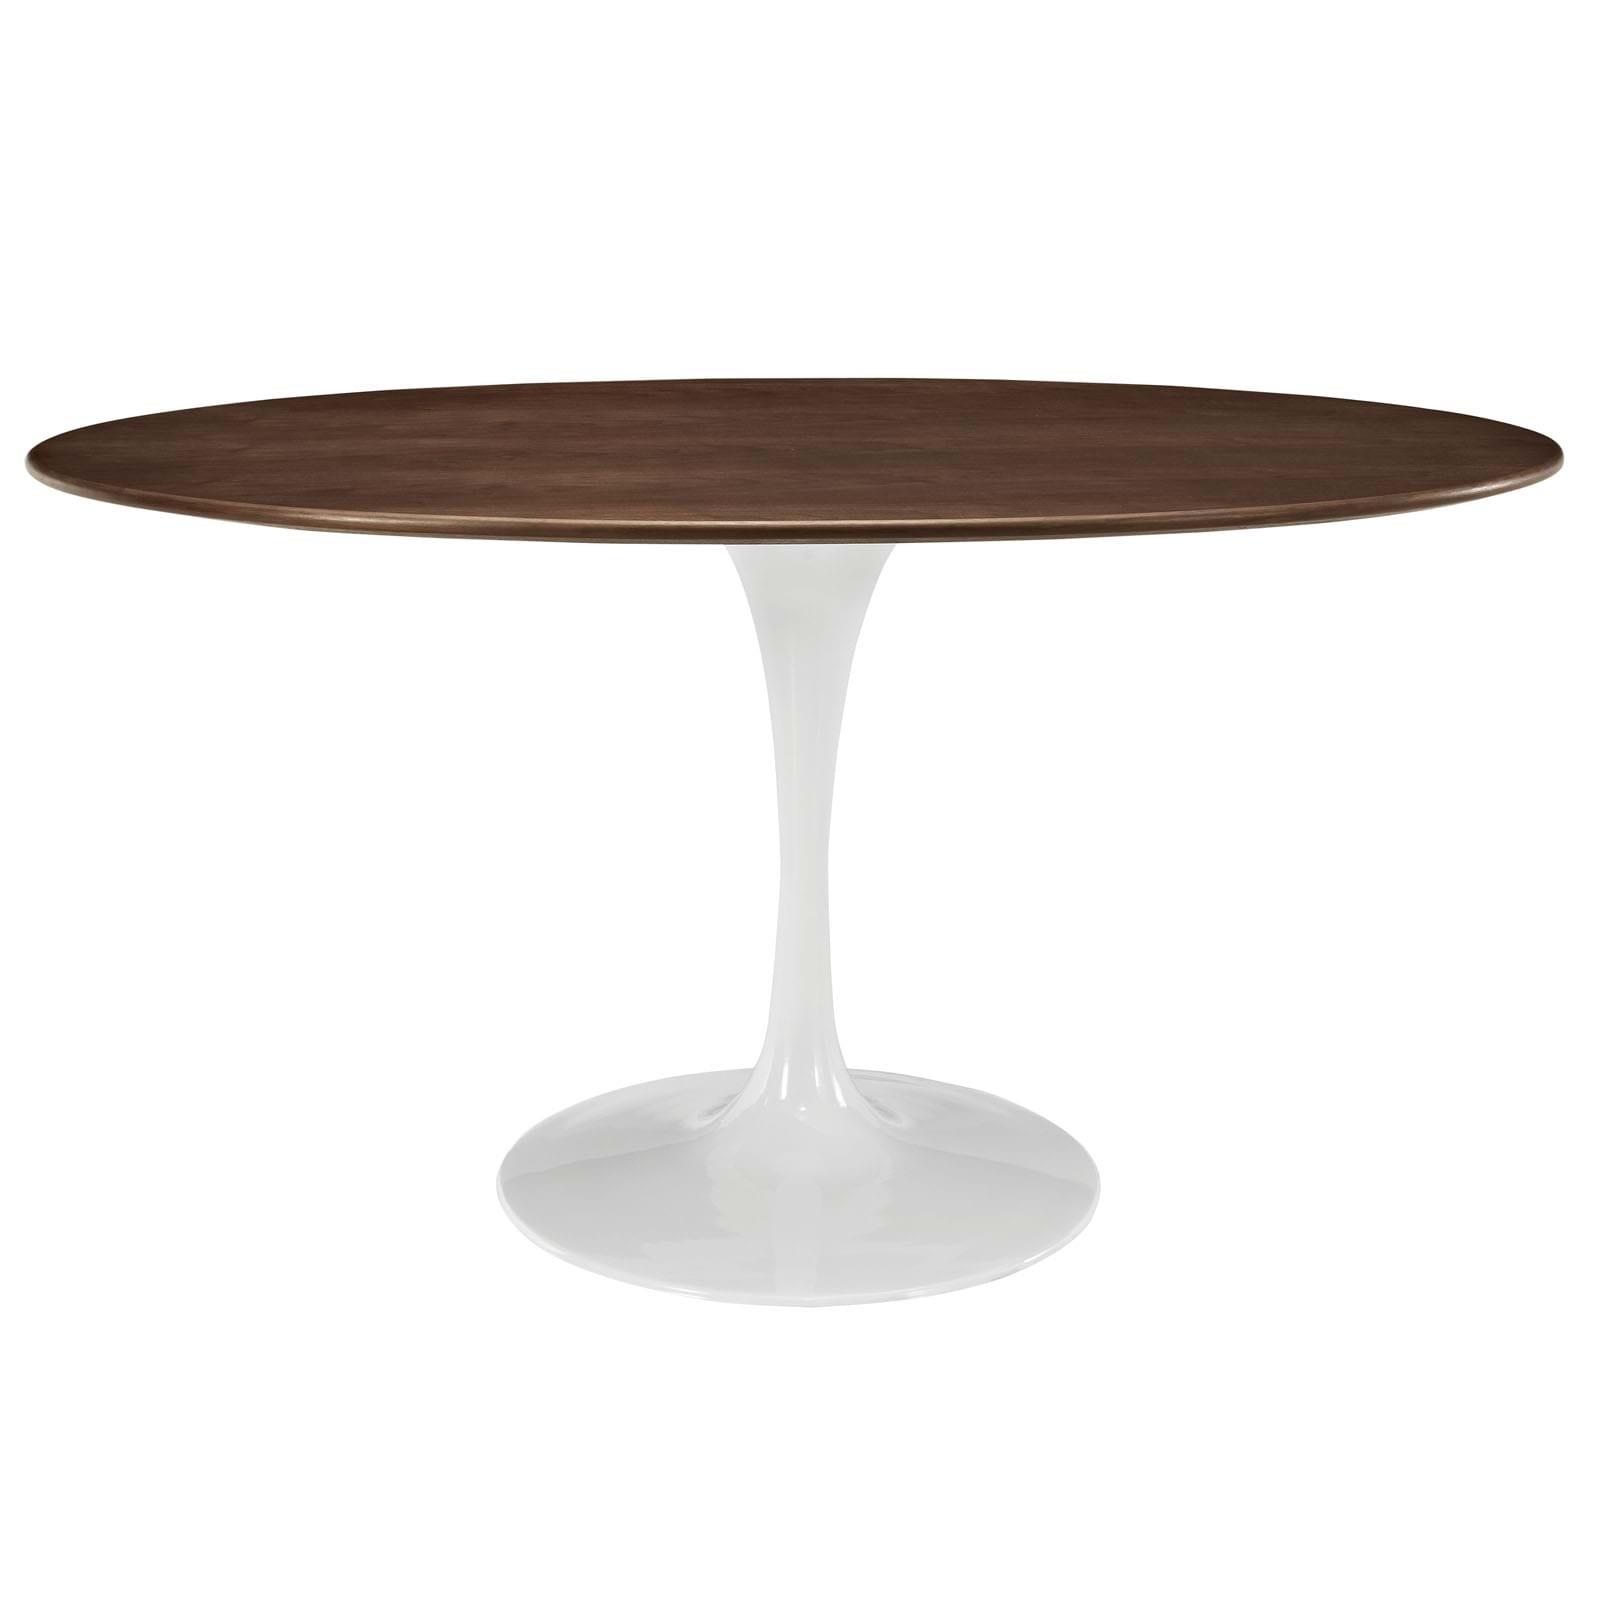 "Lippa 60"" Oval-Shaped Walnut Dining Table"